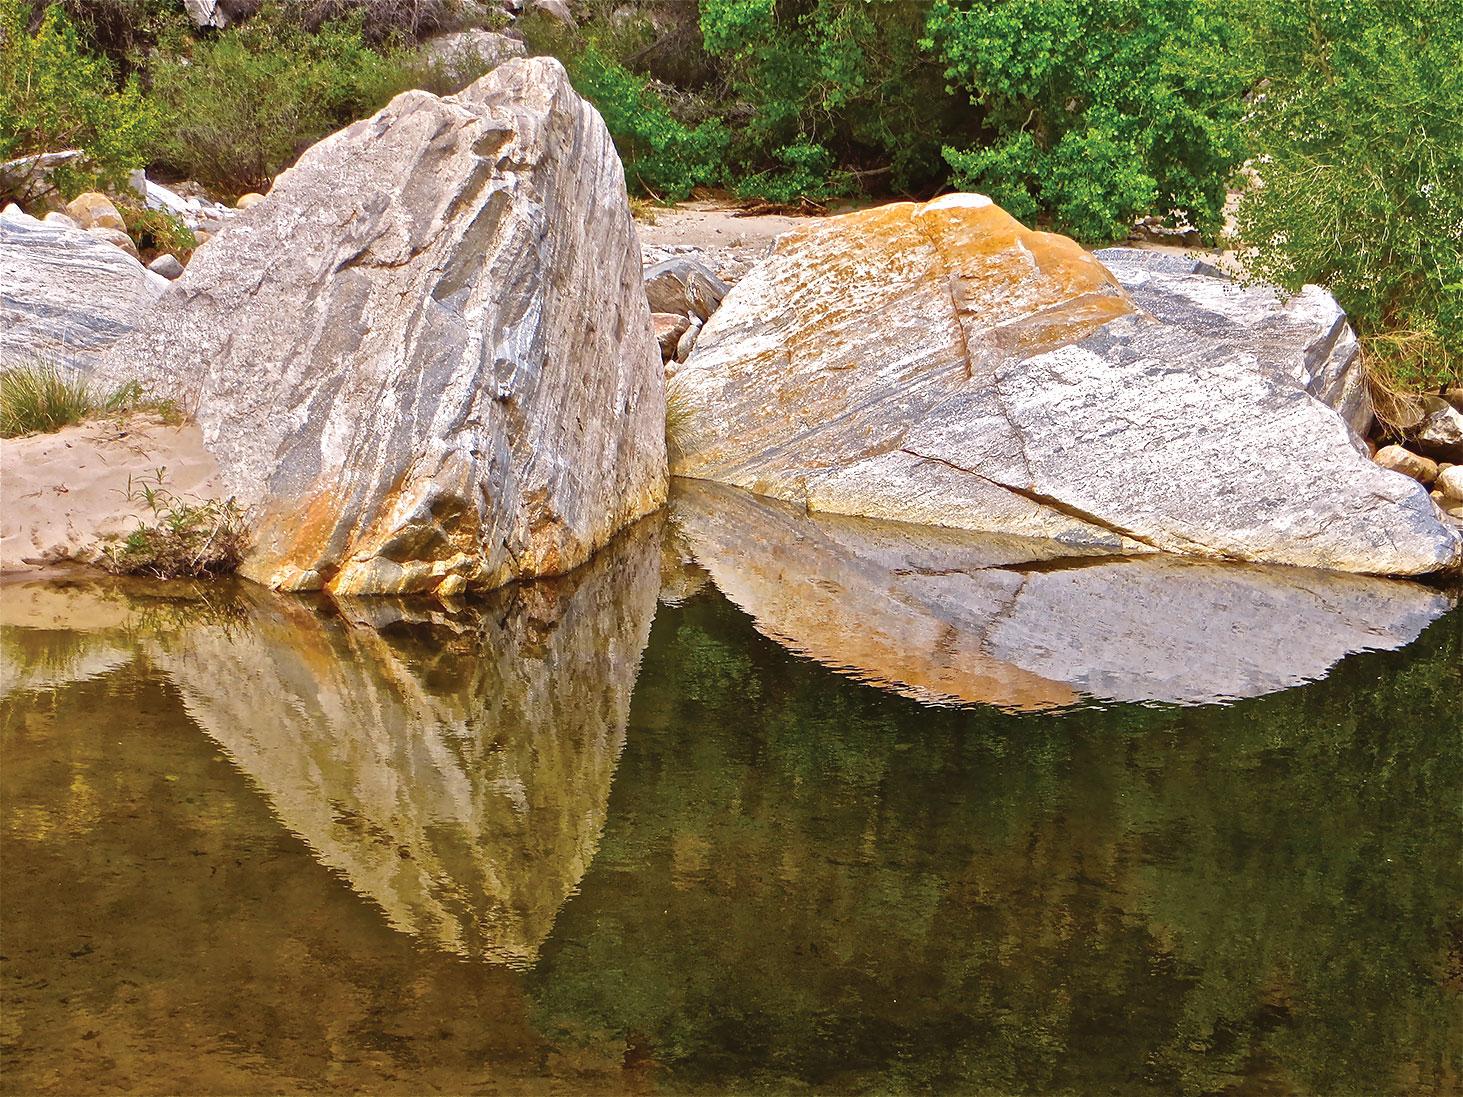 Second Place: Steve Piepmeier - Sabino Creek Gneiss